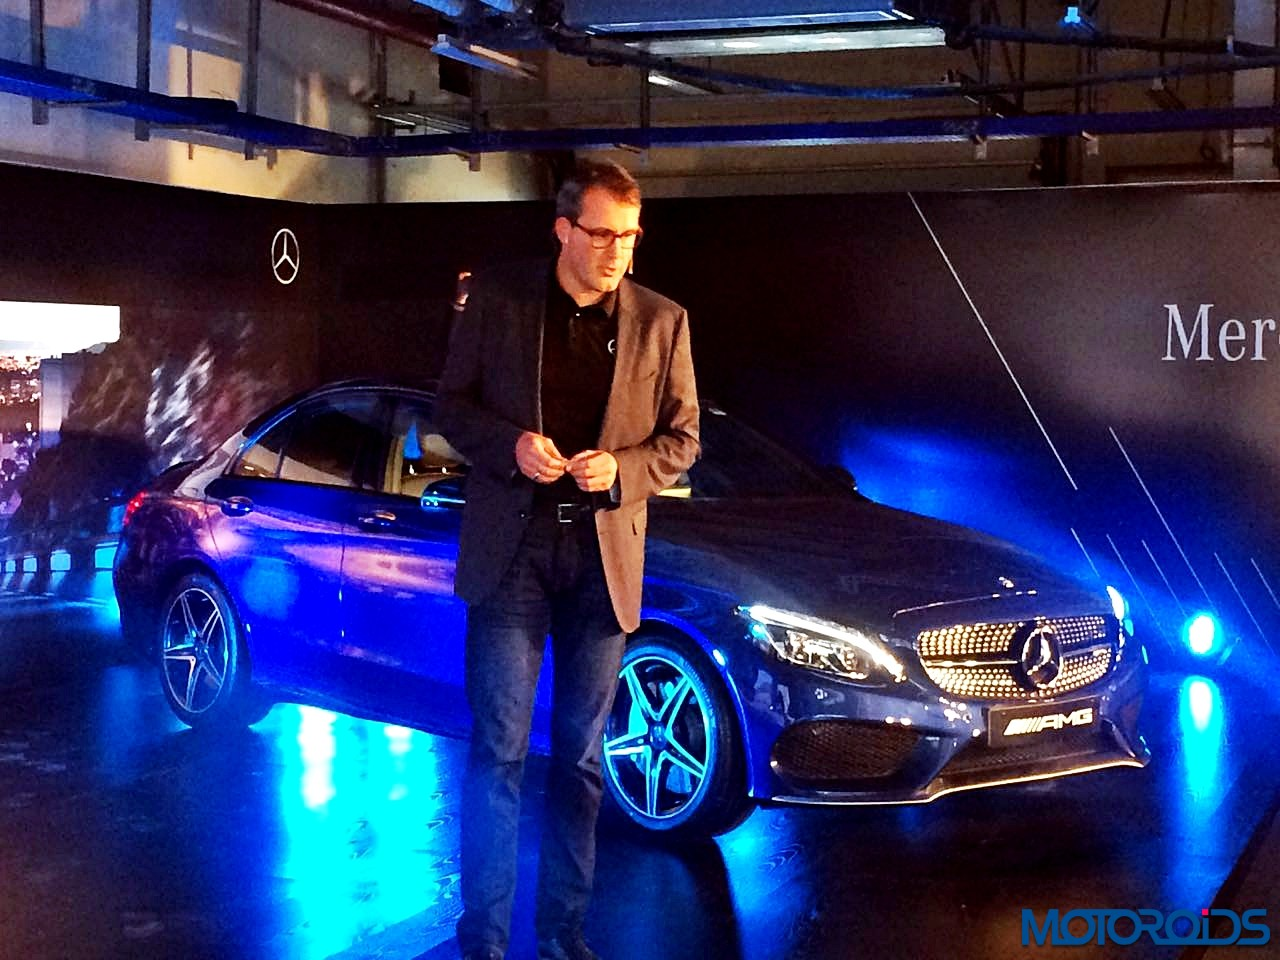 Mercedes-AMG-C43-4Matic-4